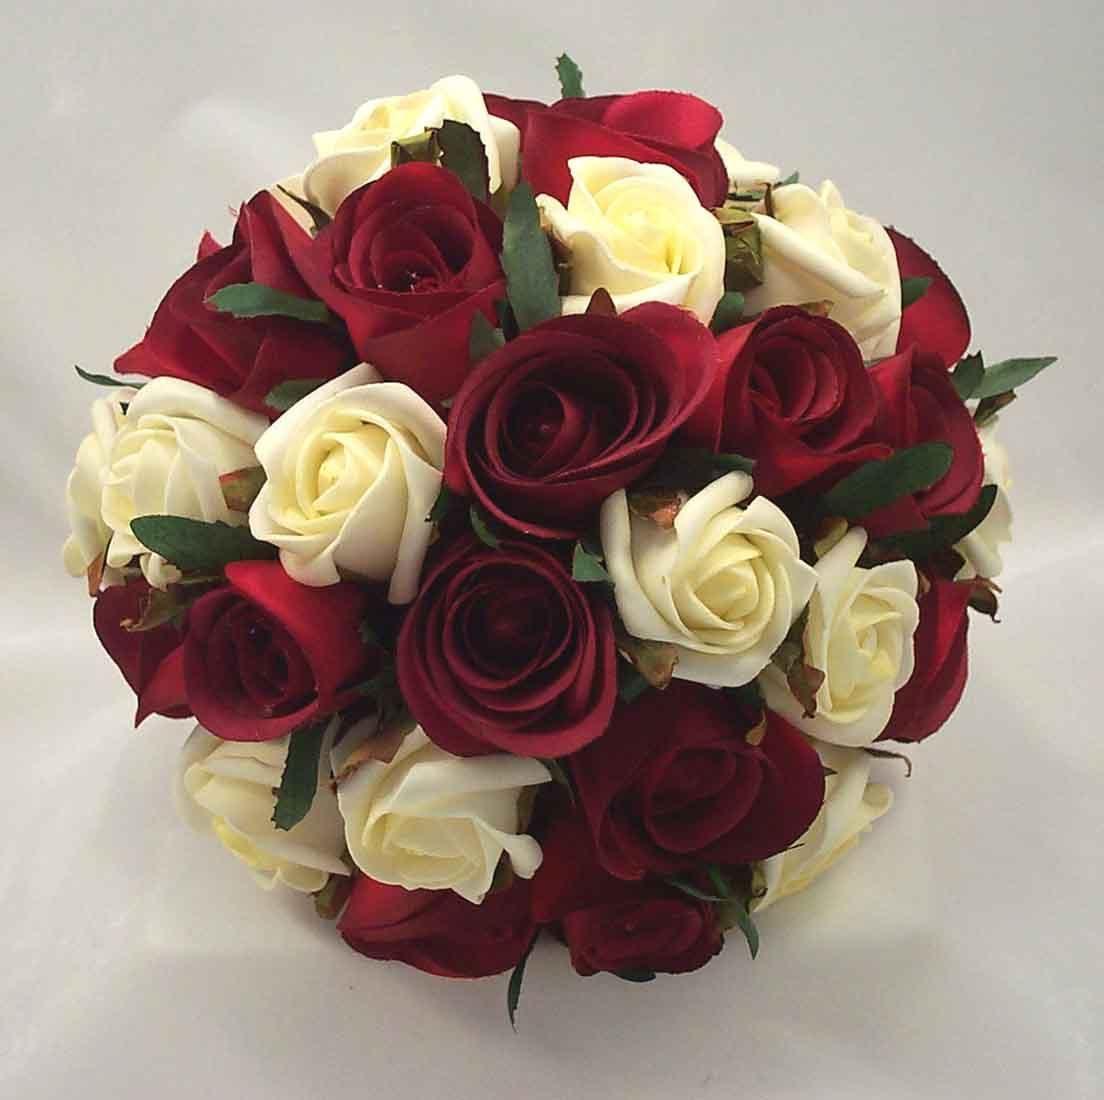 wedding flower bouquets Details about BURGUNDY IVORY ROSE BOUQUET WEDDING FLOWERS BRIDAL